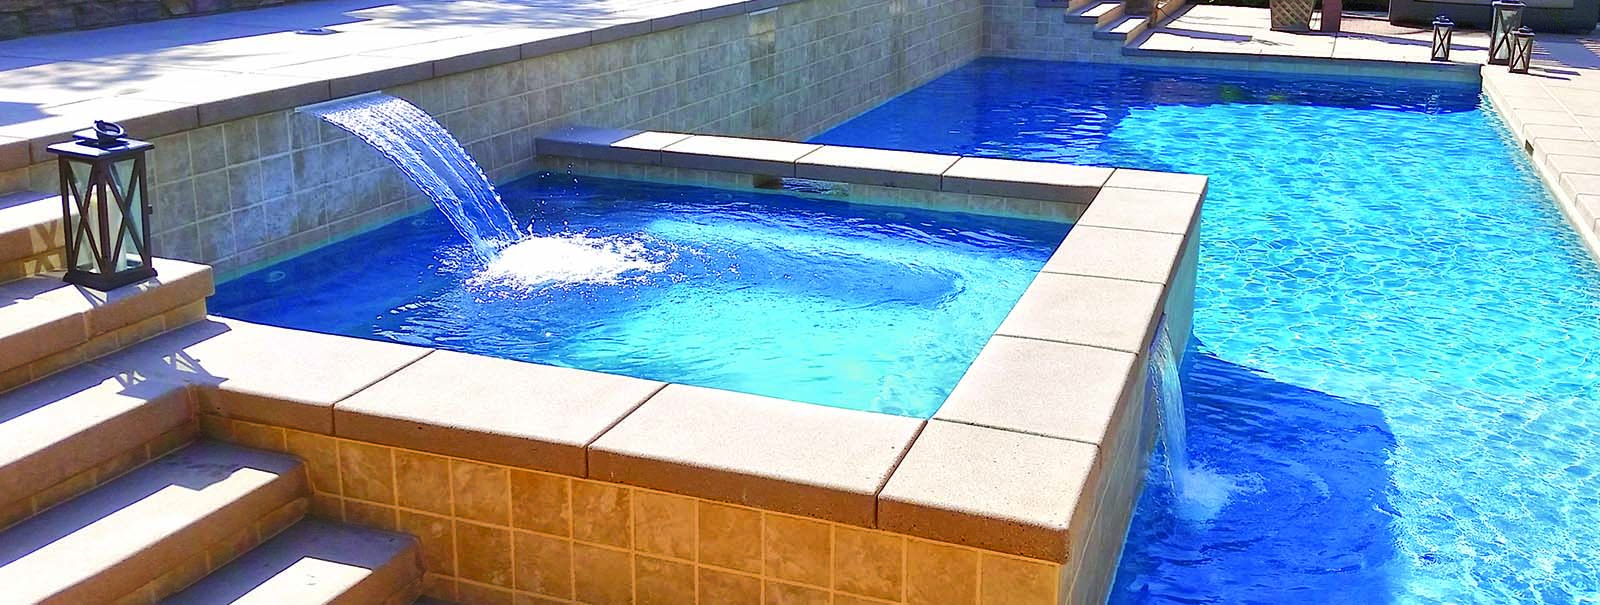 San Diego Gunite Pool and Spa